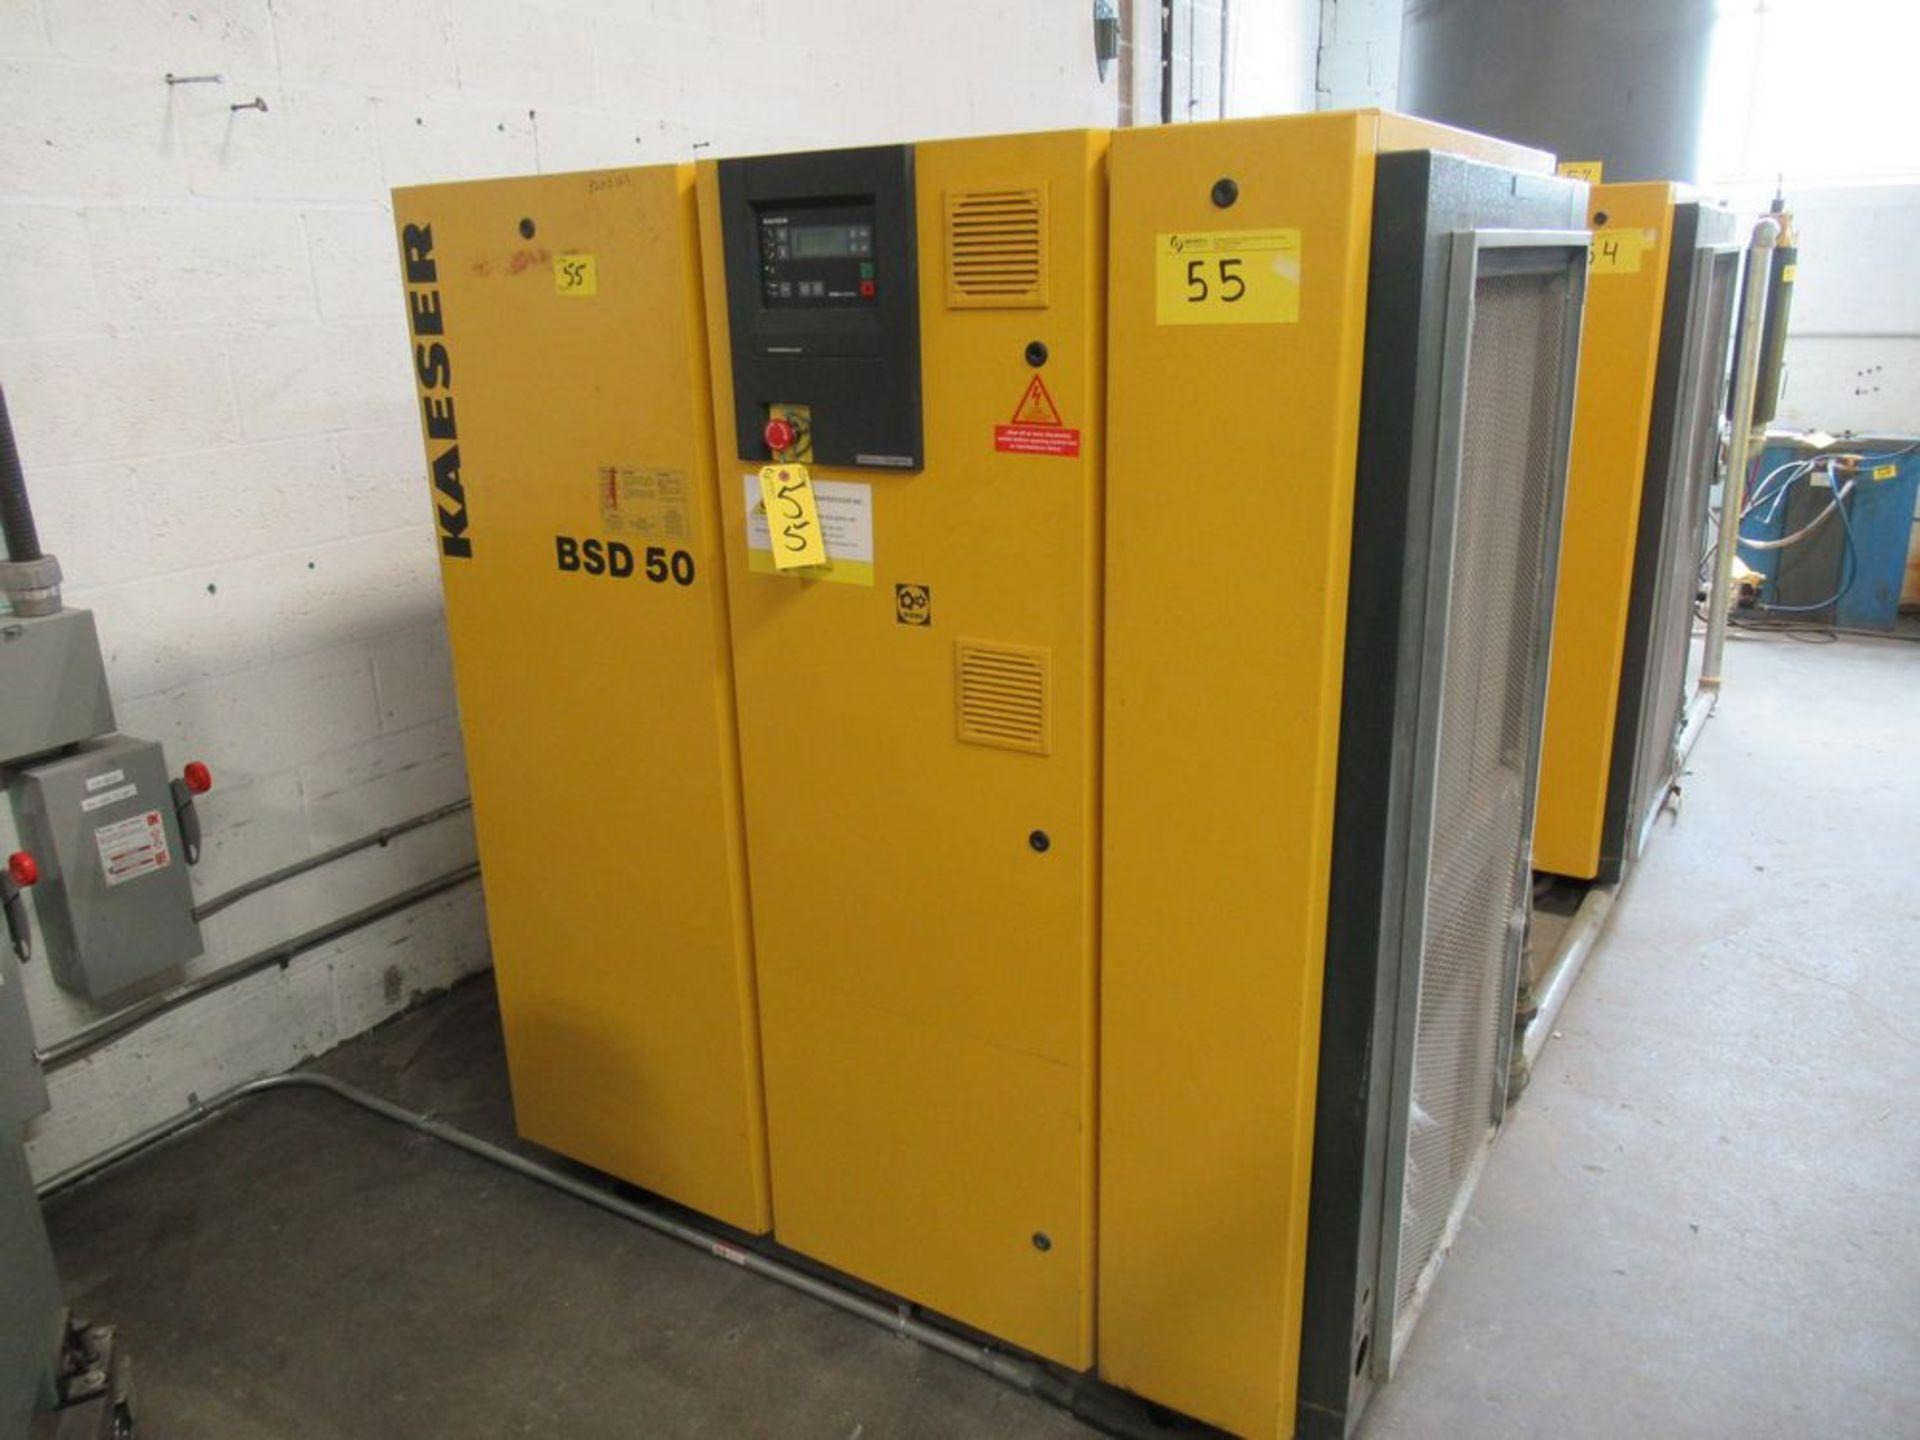 2002 KAESER BSD-50 50HP AIR COMPRESSOR W/ SIGMA CONTROL, S/N 1002